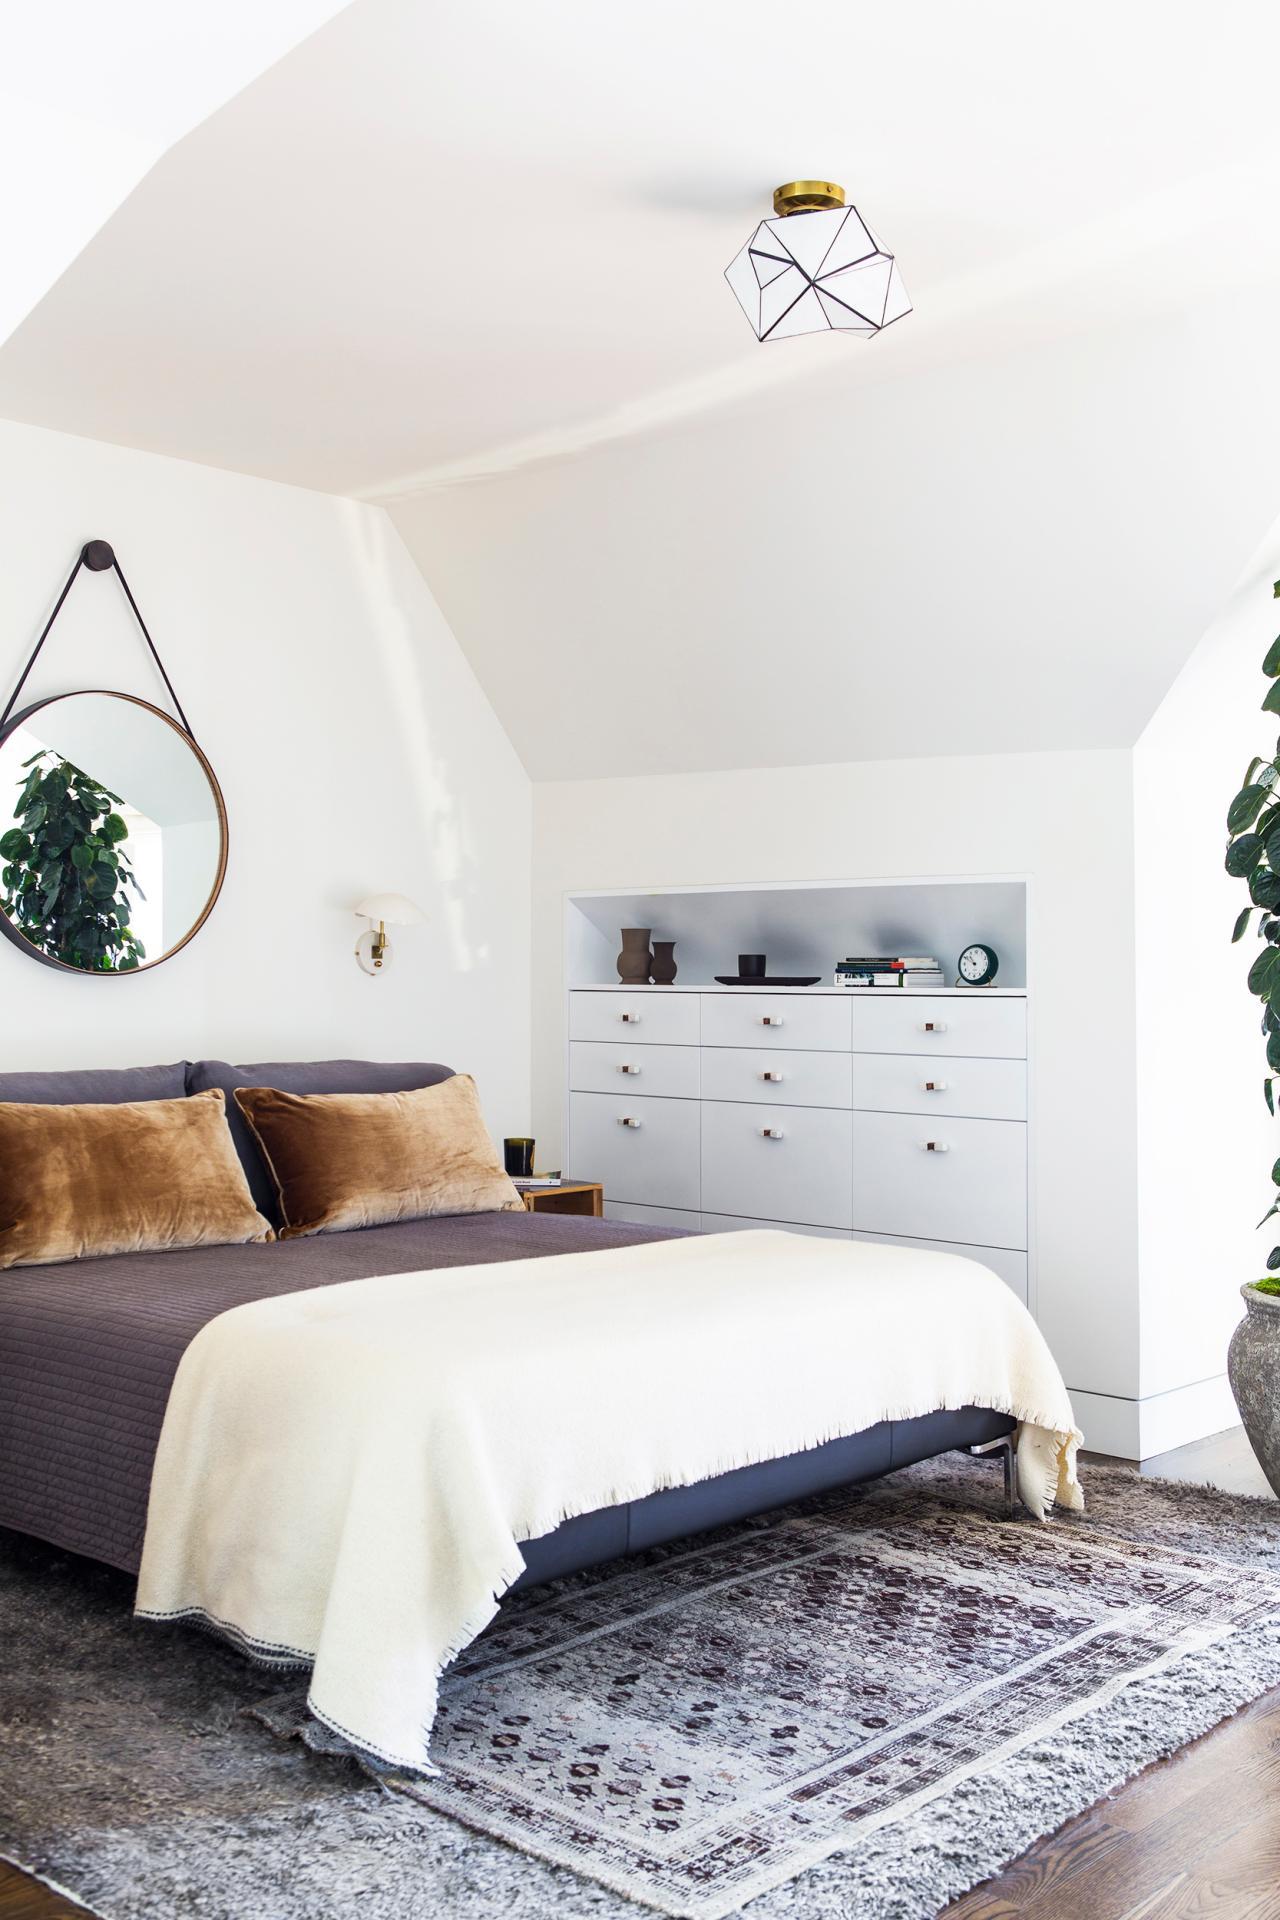 Mirror nightstands contemporary bedroom kimberley seldon design - White Contemporary Master Bedroom With Round Mirror